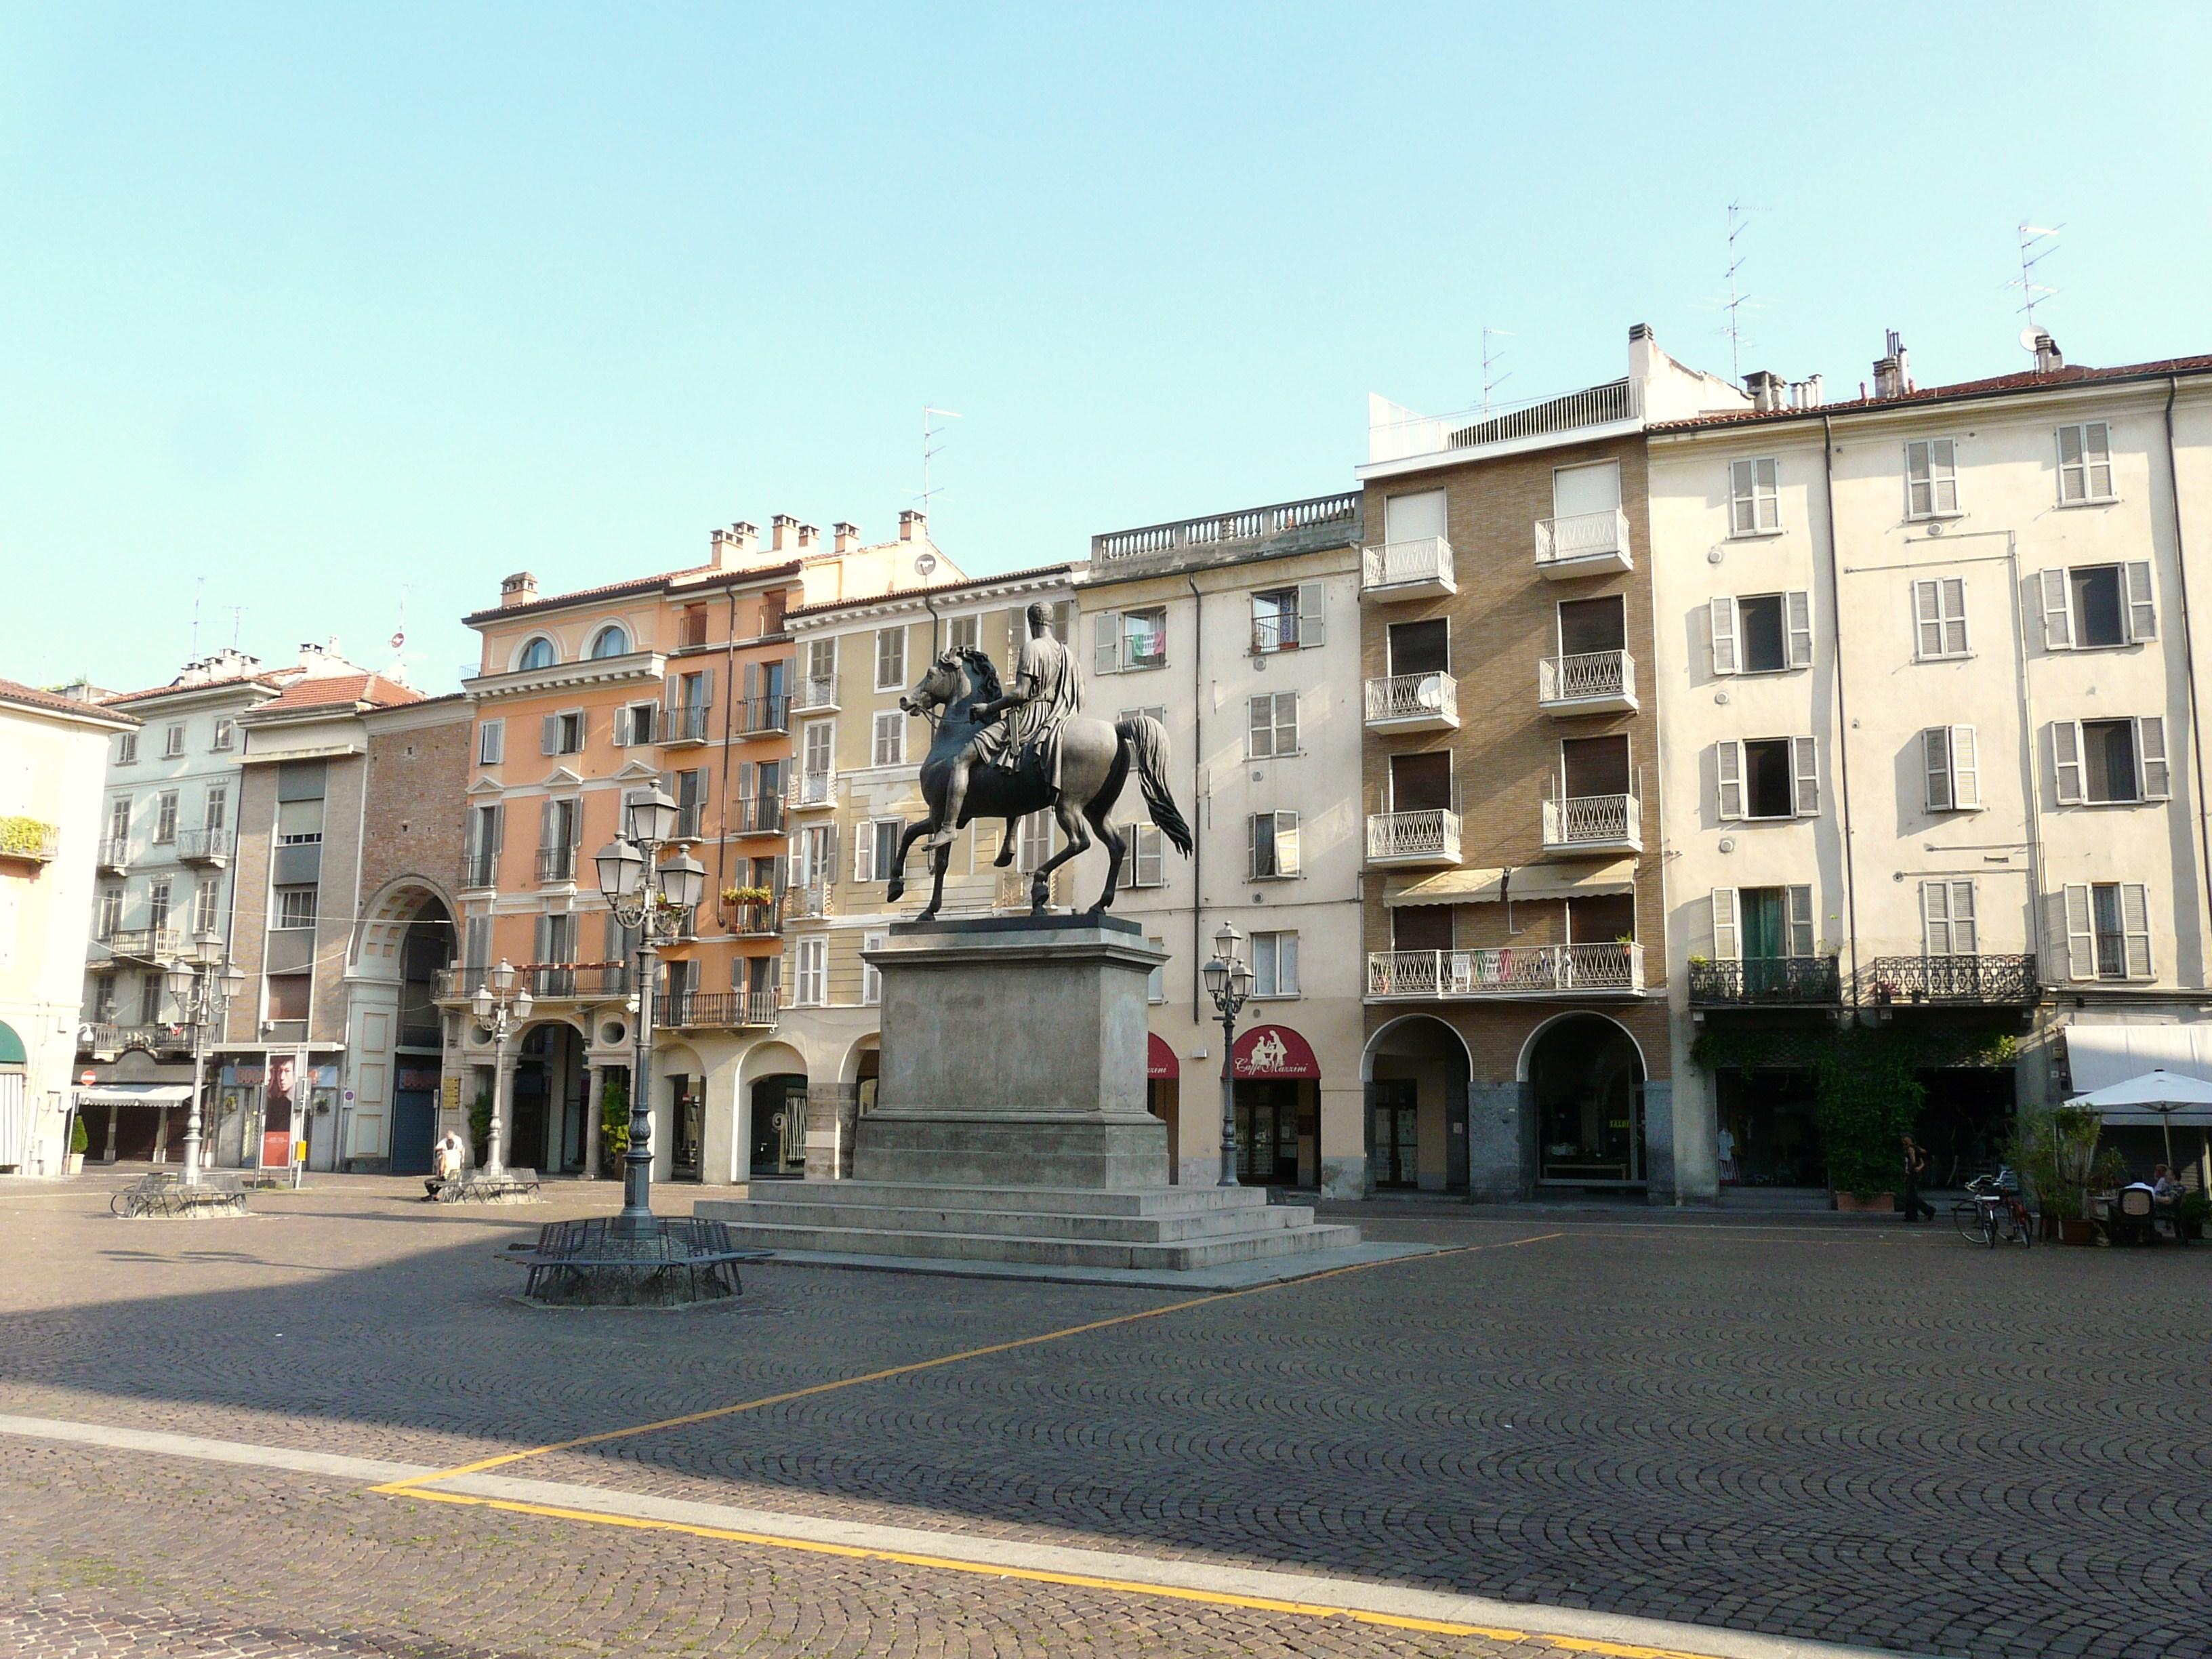 Casale Monferrato Italien